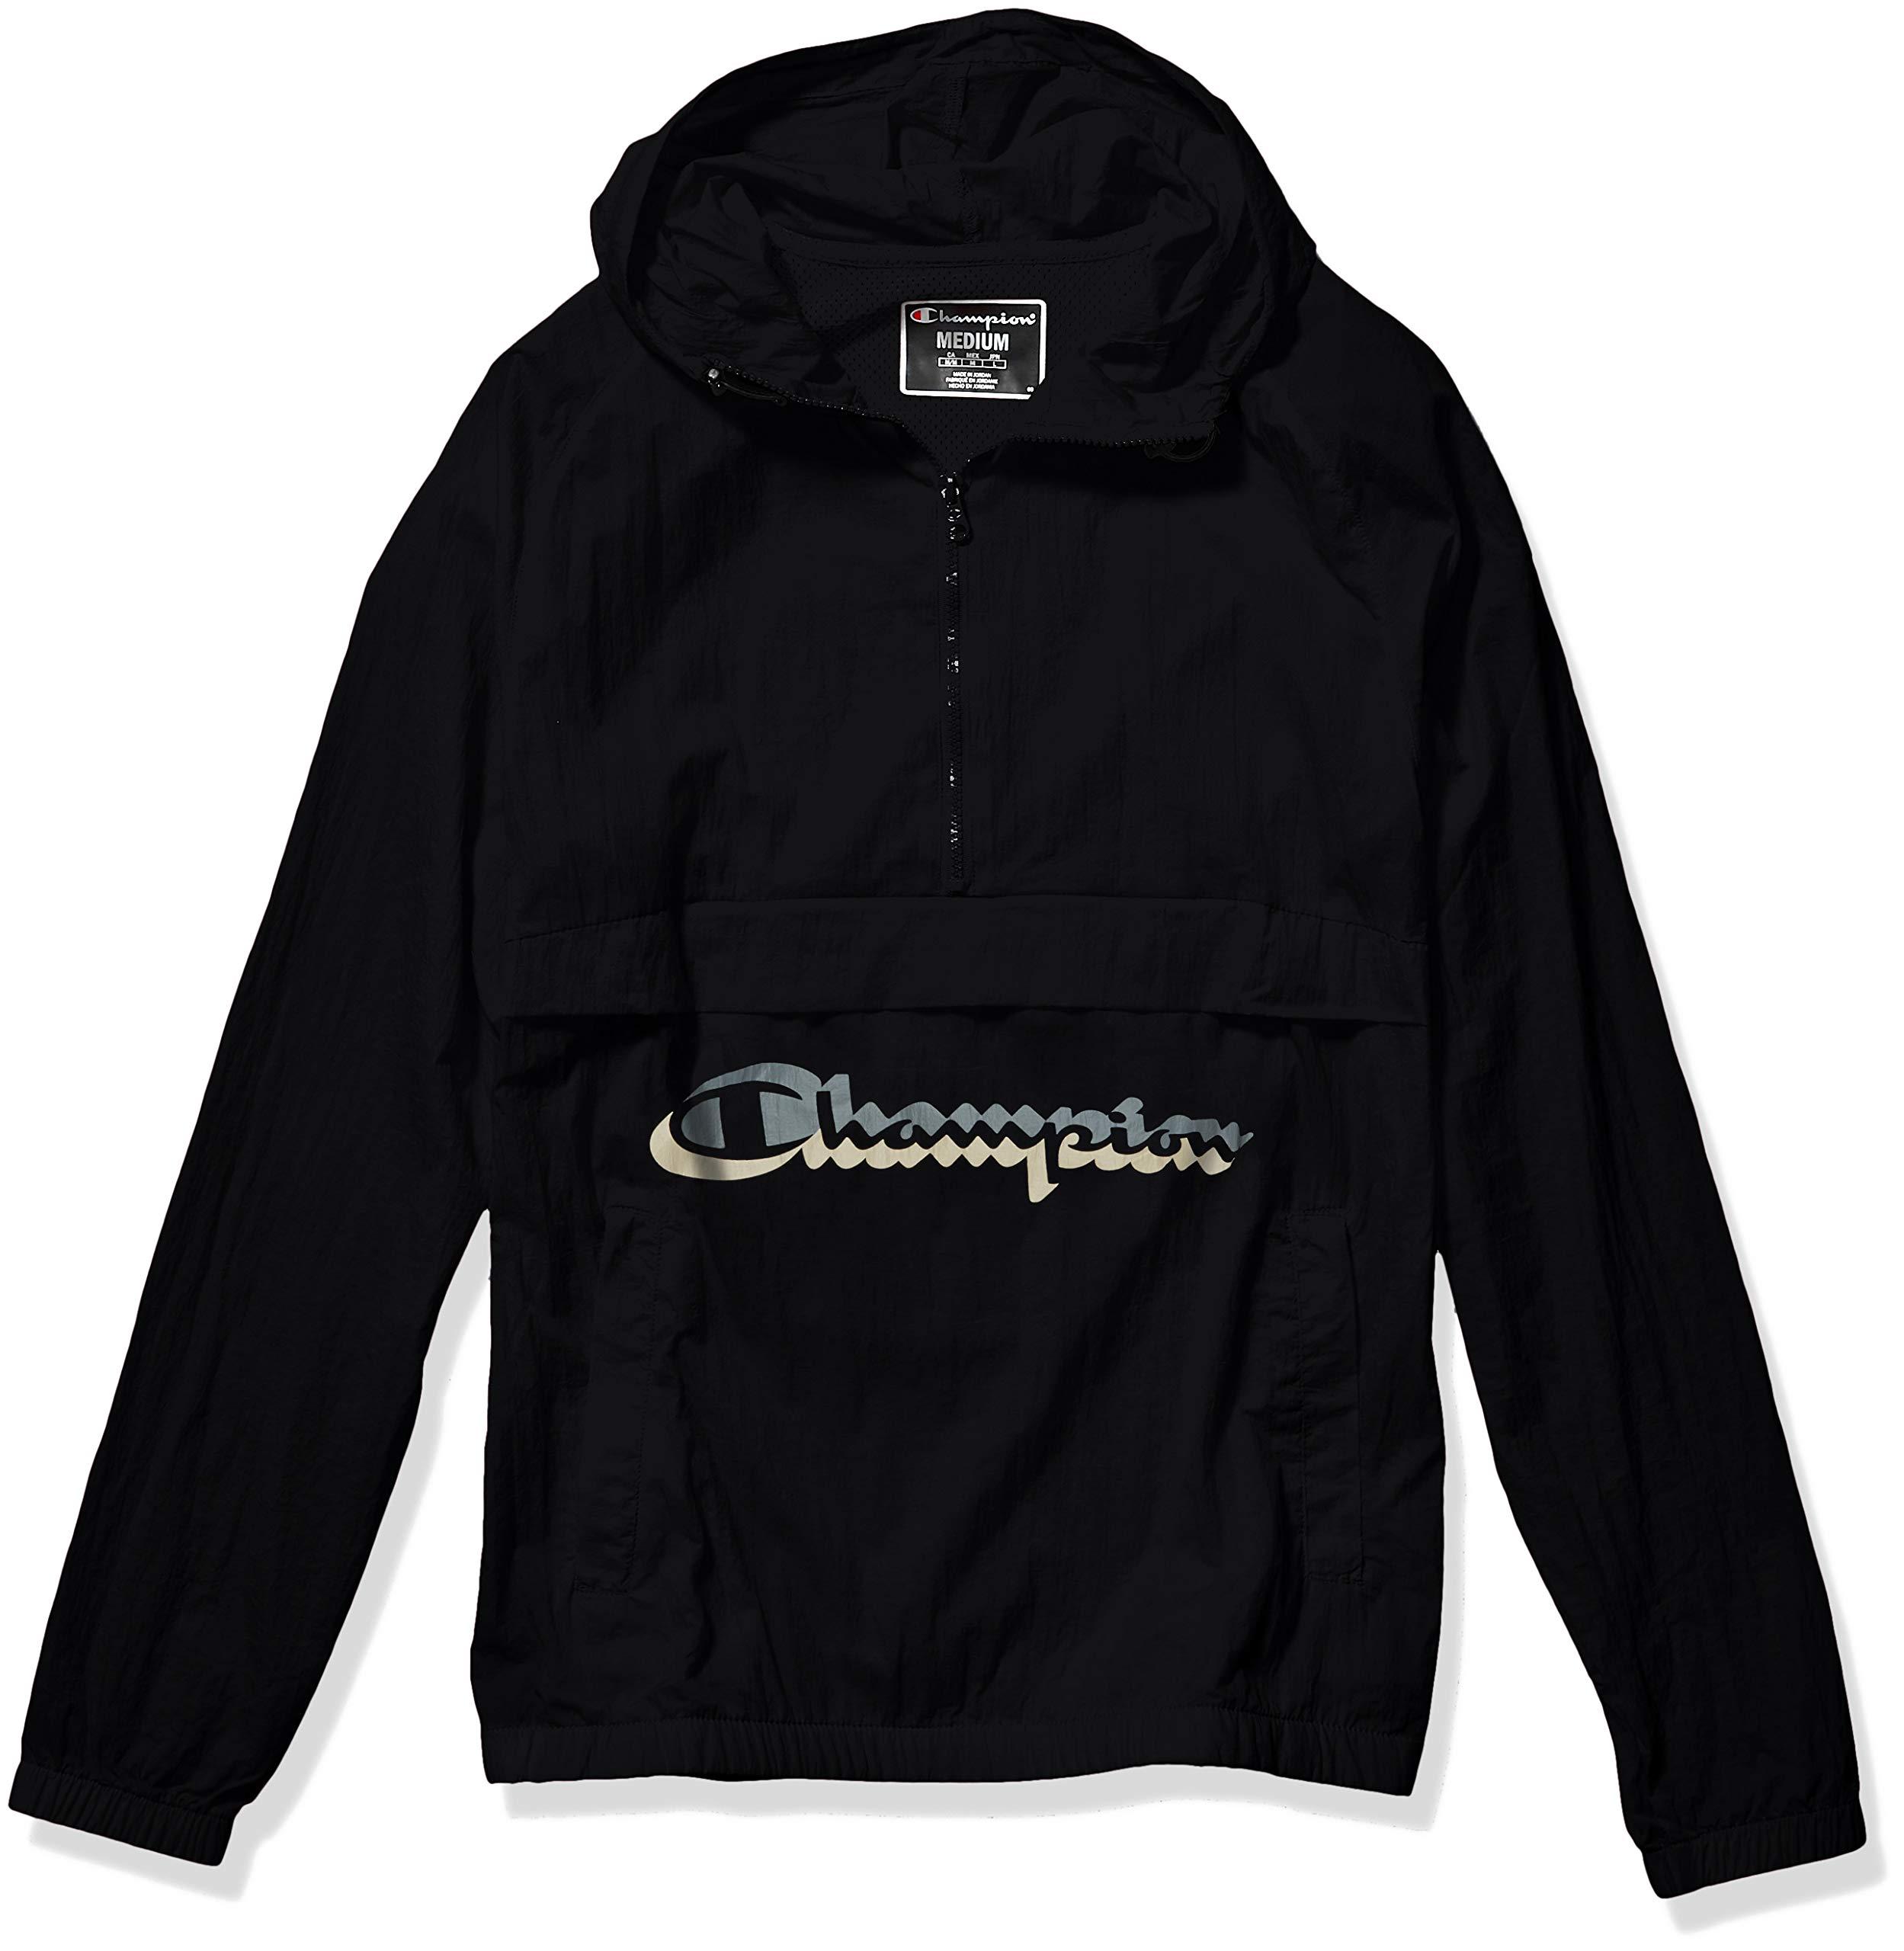 Champion LIFE Men's Anorak Windbreaker, Black w/Shadow Script, Medium by Champion LIFE